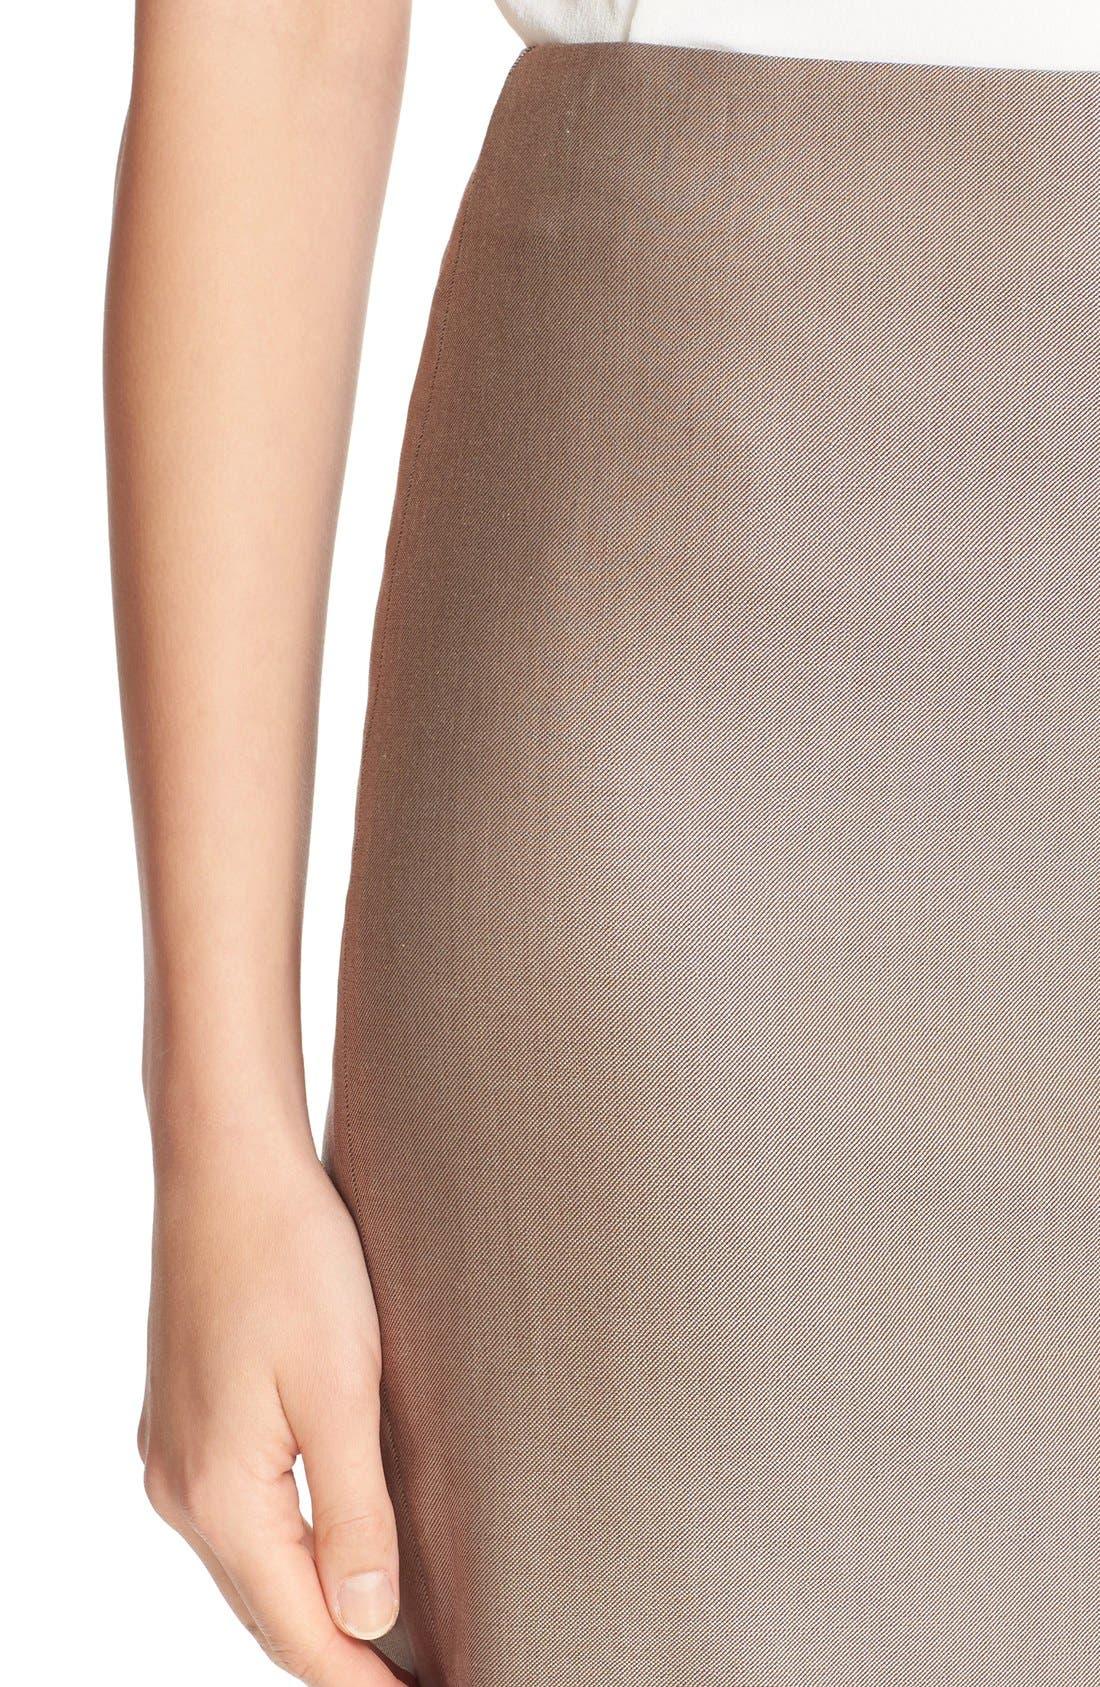 Wool Blend Pencil Skirt,                             Alternate thumbnail 10, color,                             220